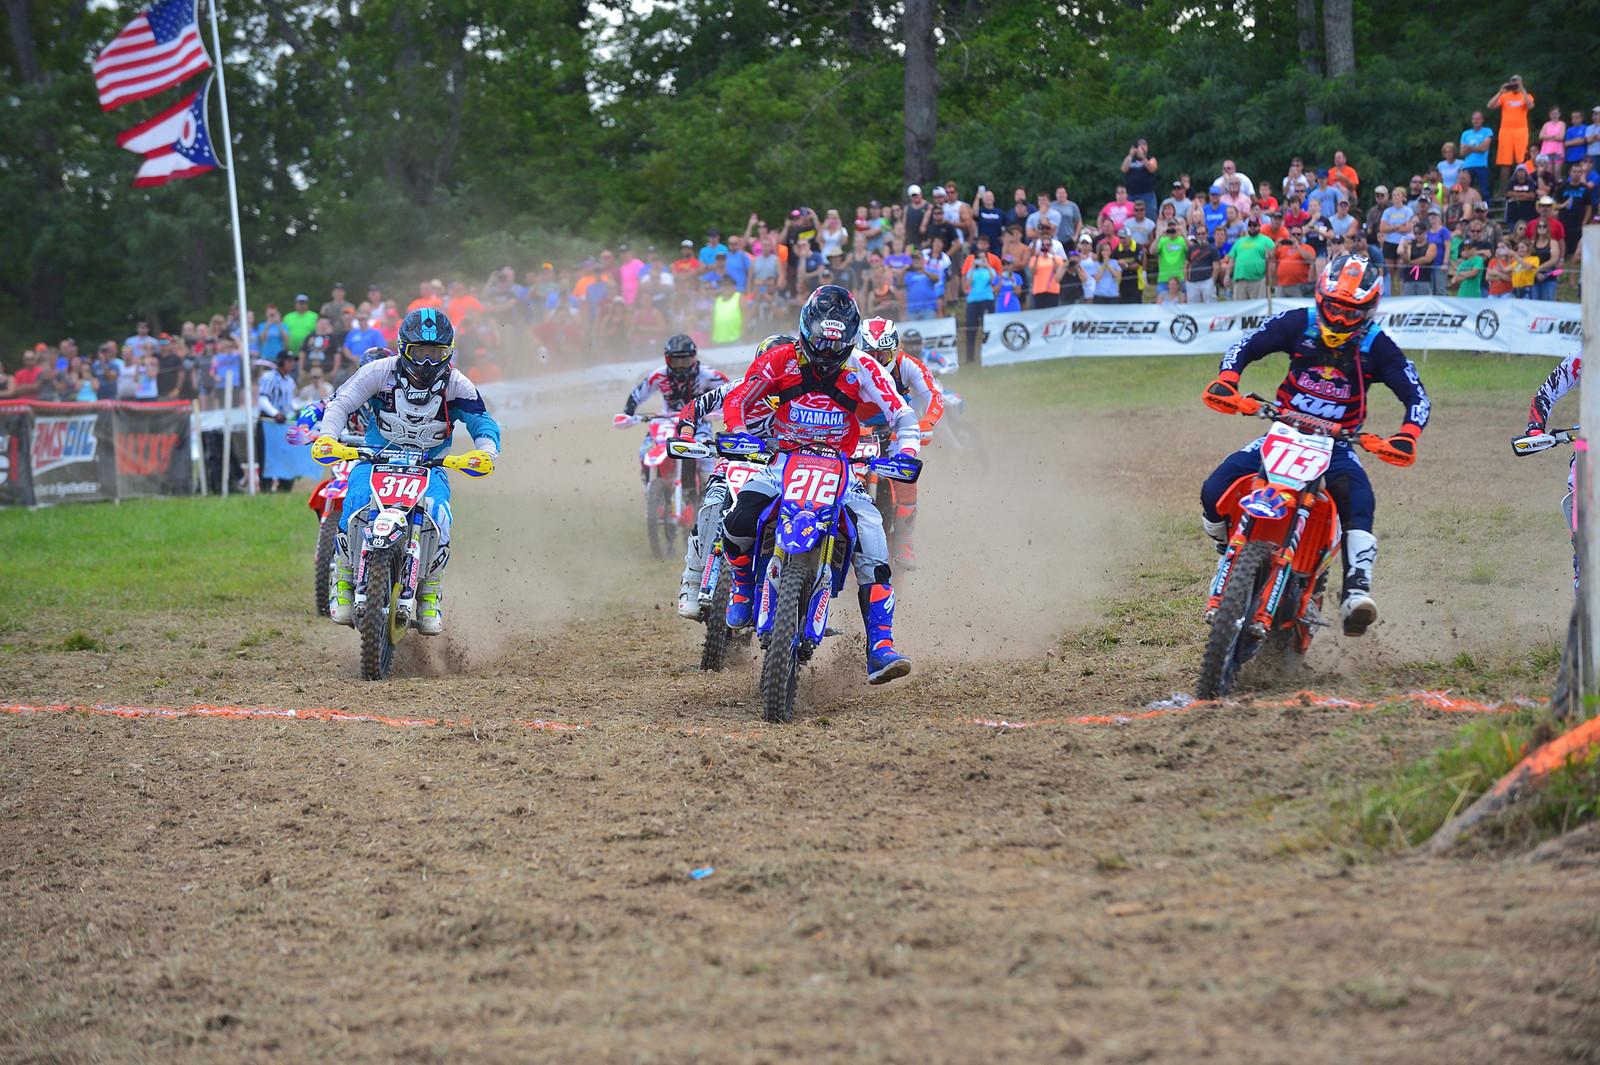 John Penton GNCC Photo Gallery - John Penton GNCC - Motocross Pictures - Vital MX